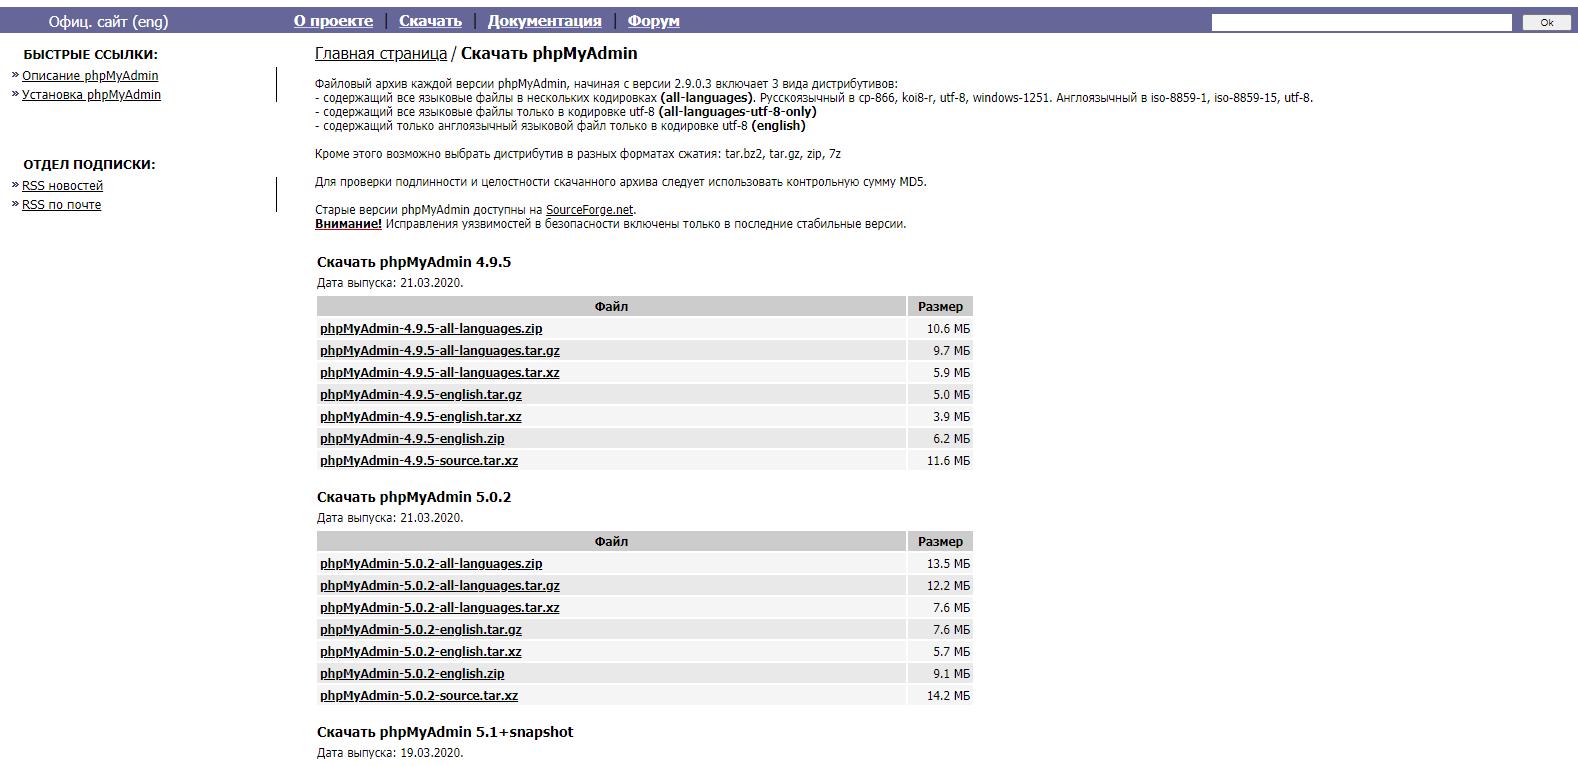 Скачивание архива phpMyAdmin с сайта